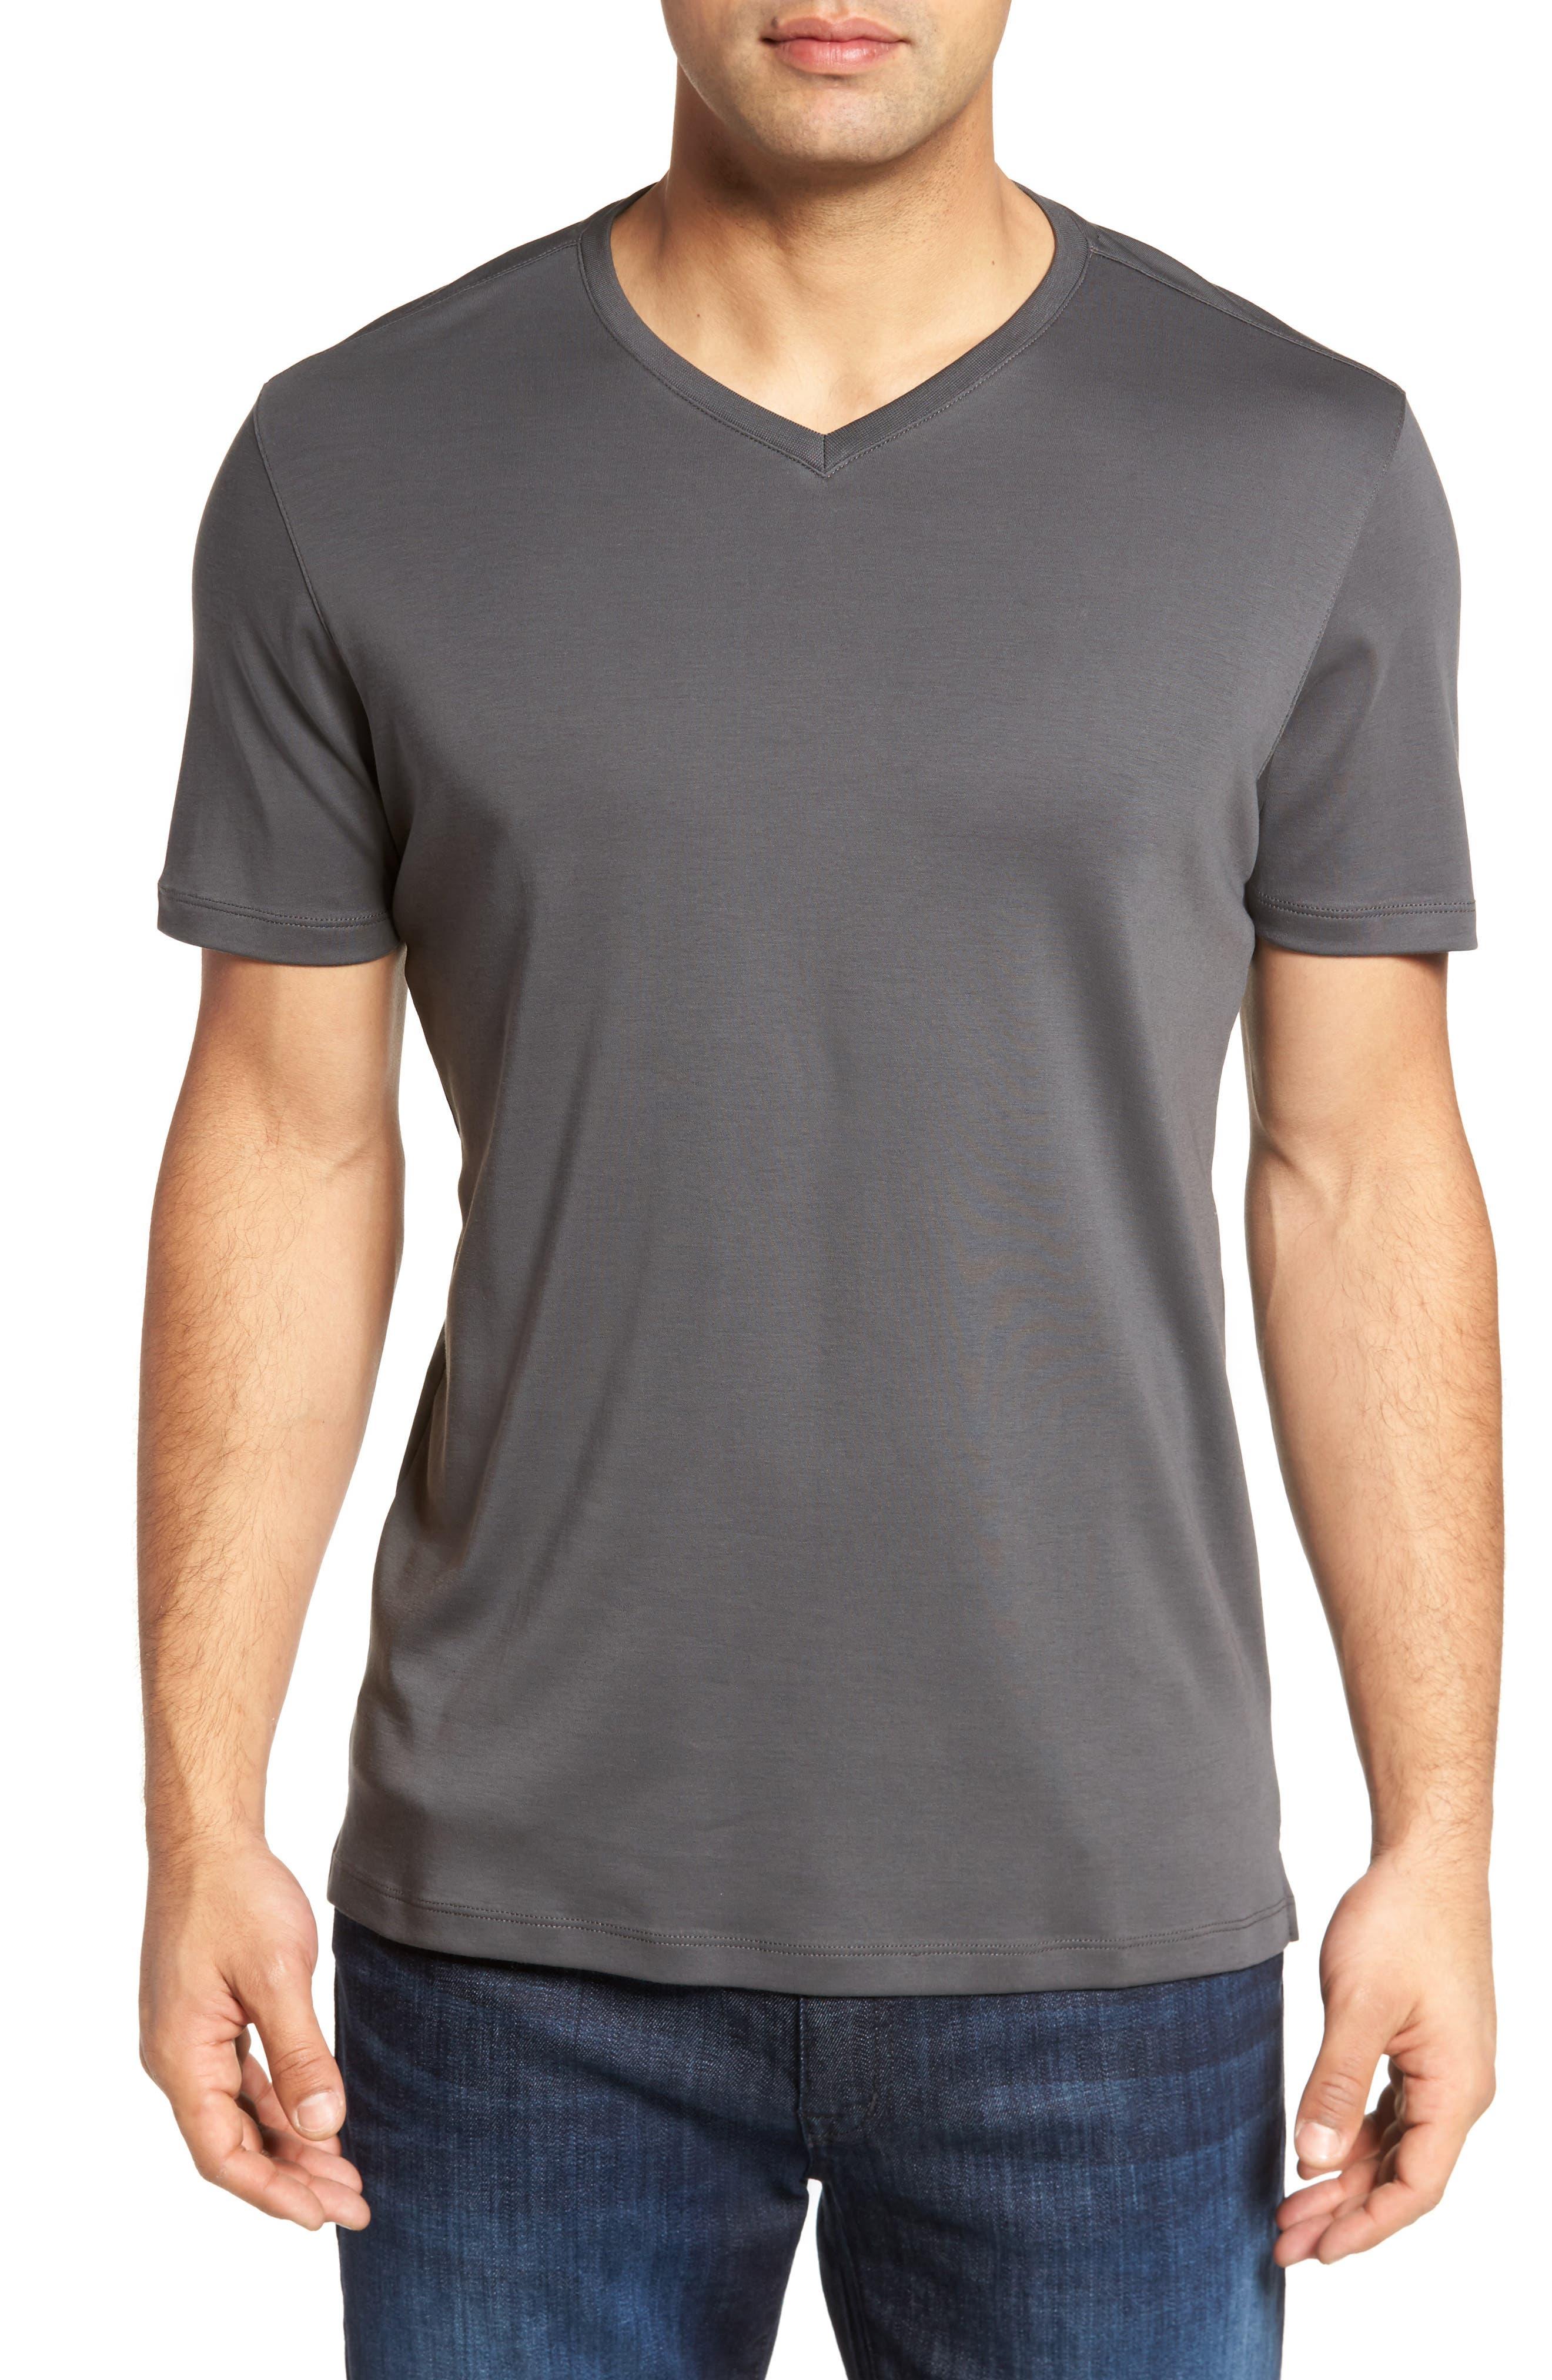 Main Image - Robert Barakett Georgia Regular Fit V-Neck T-Shirt